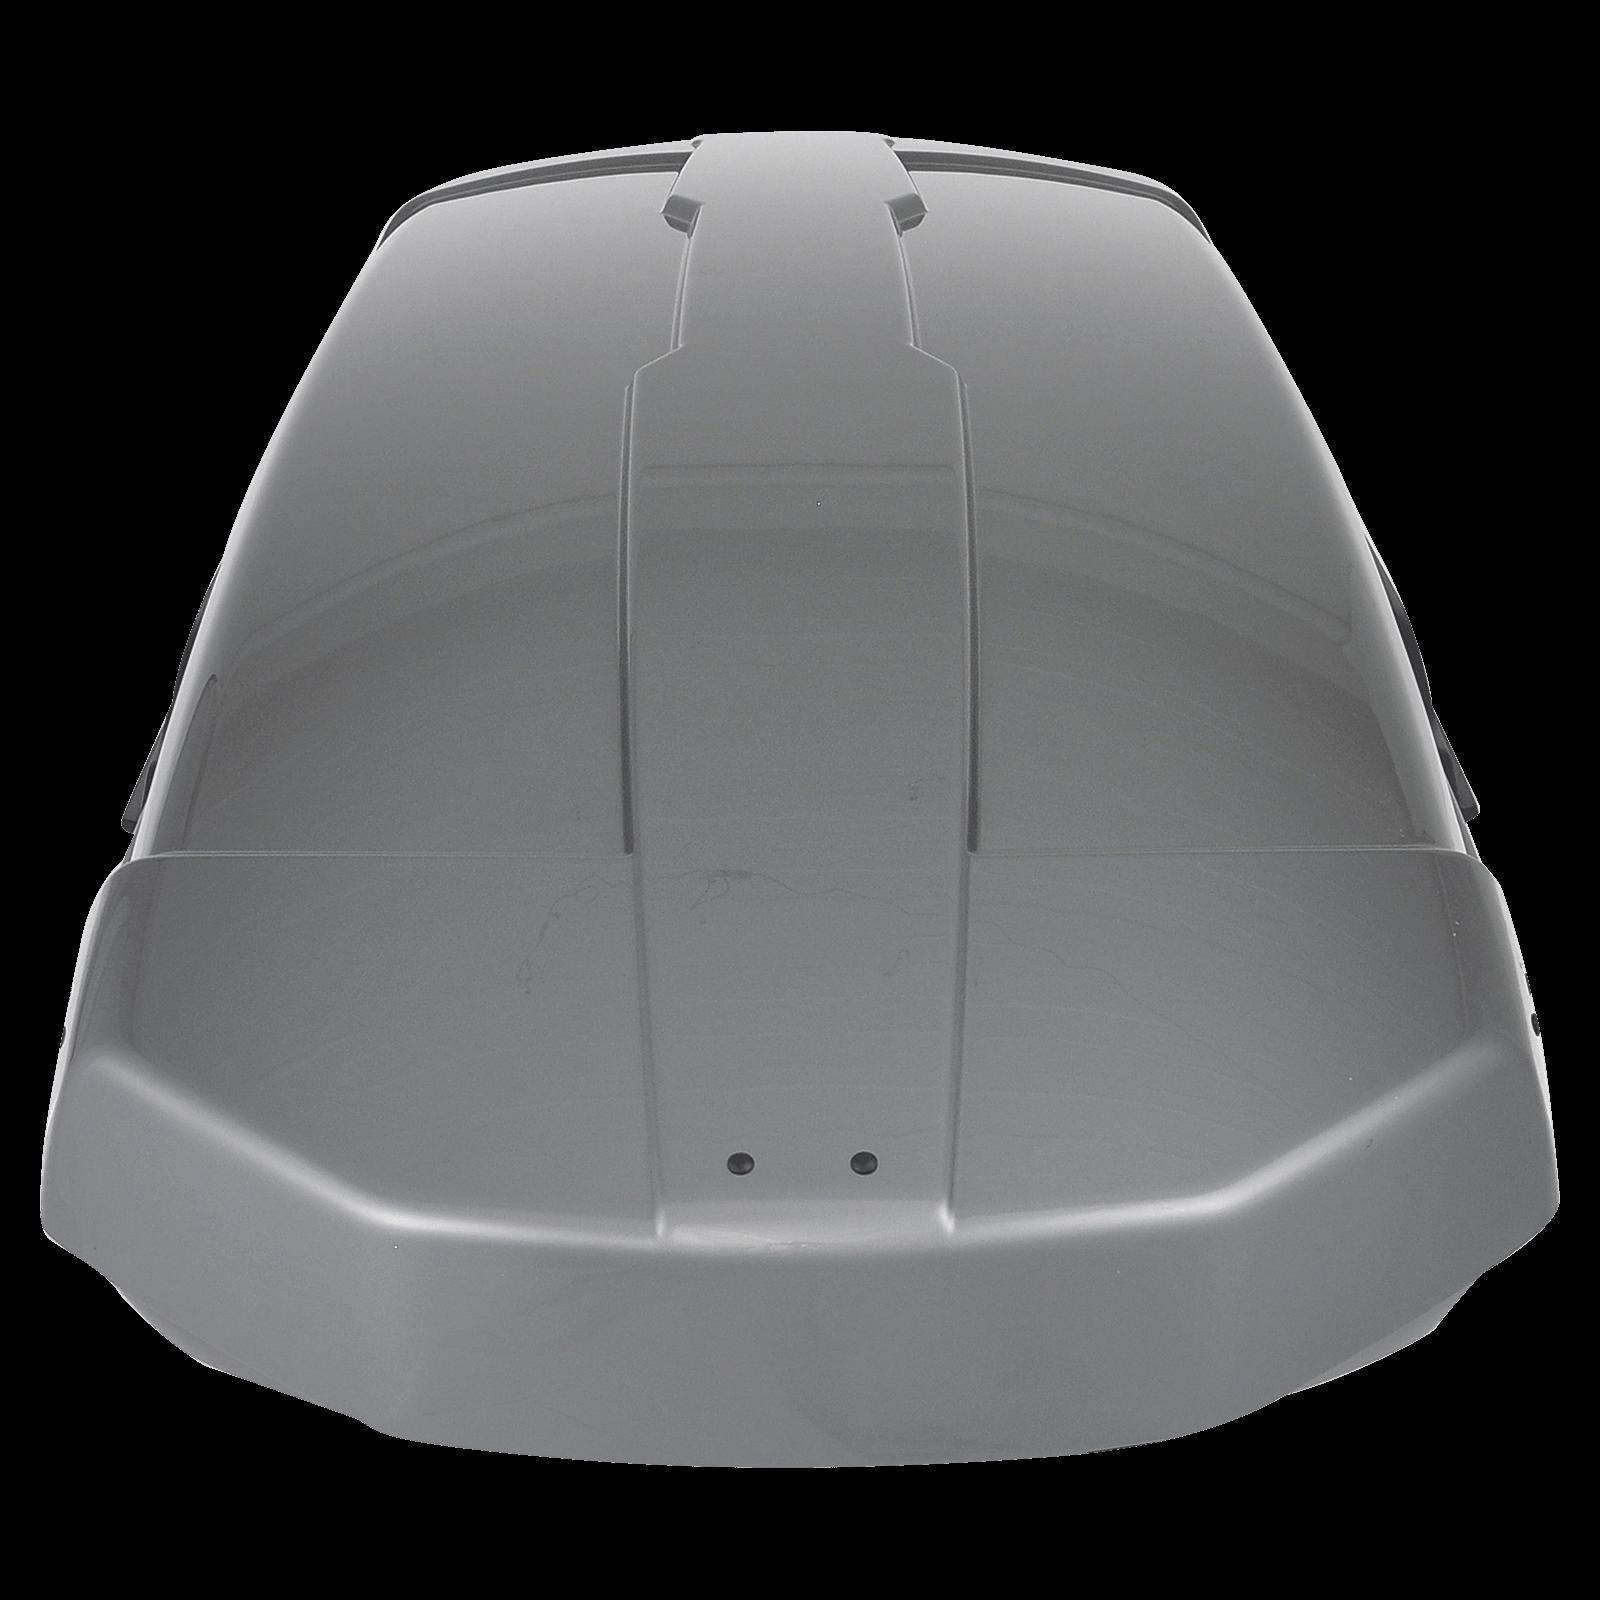 Dachbox Thule Motion XT XL Titan Glossy - Bild 3